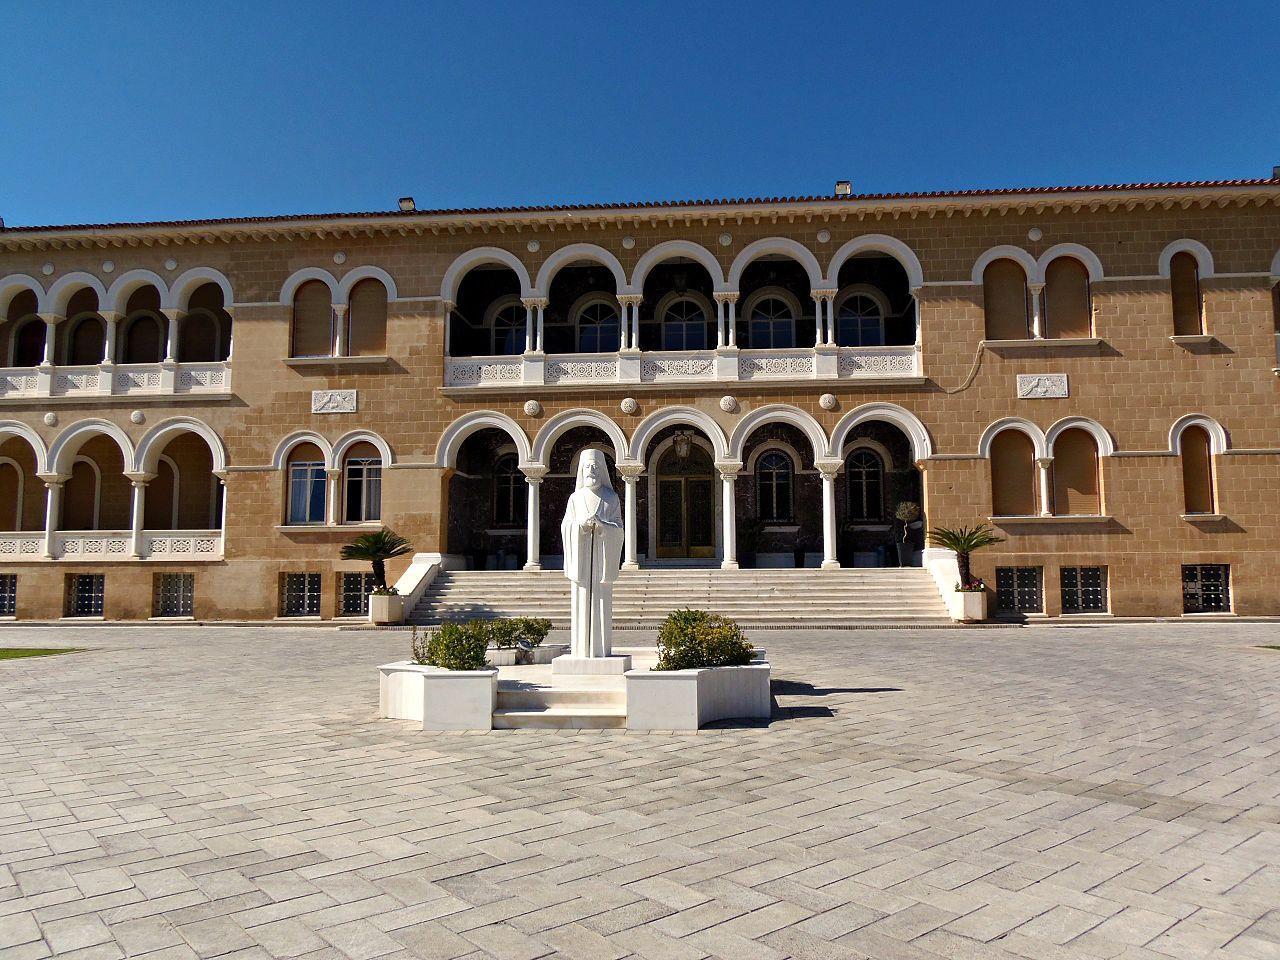 Памятник Архиепископу Макариосу III во Дворце Архиепископа, Никосия